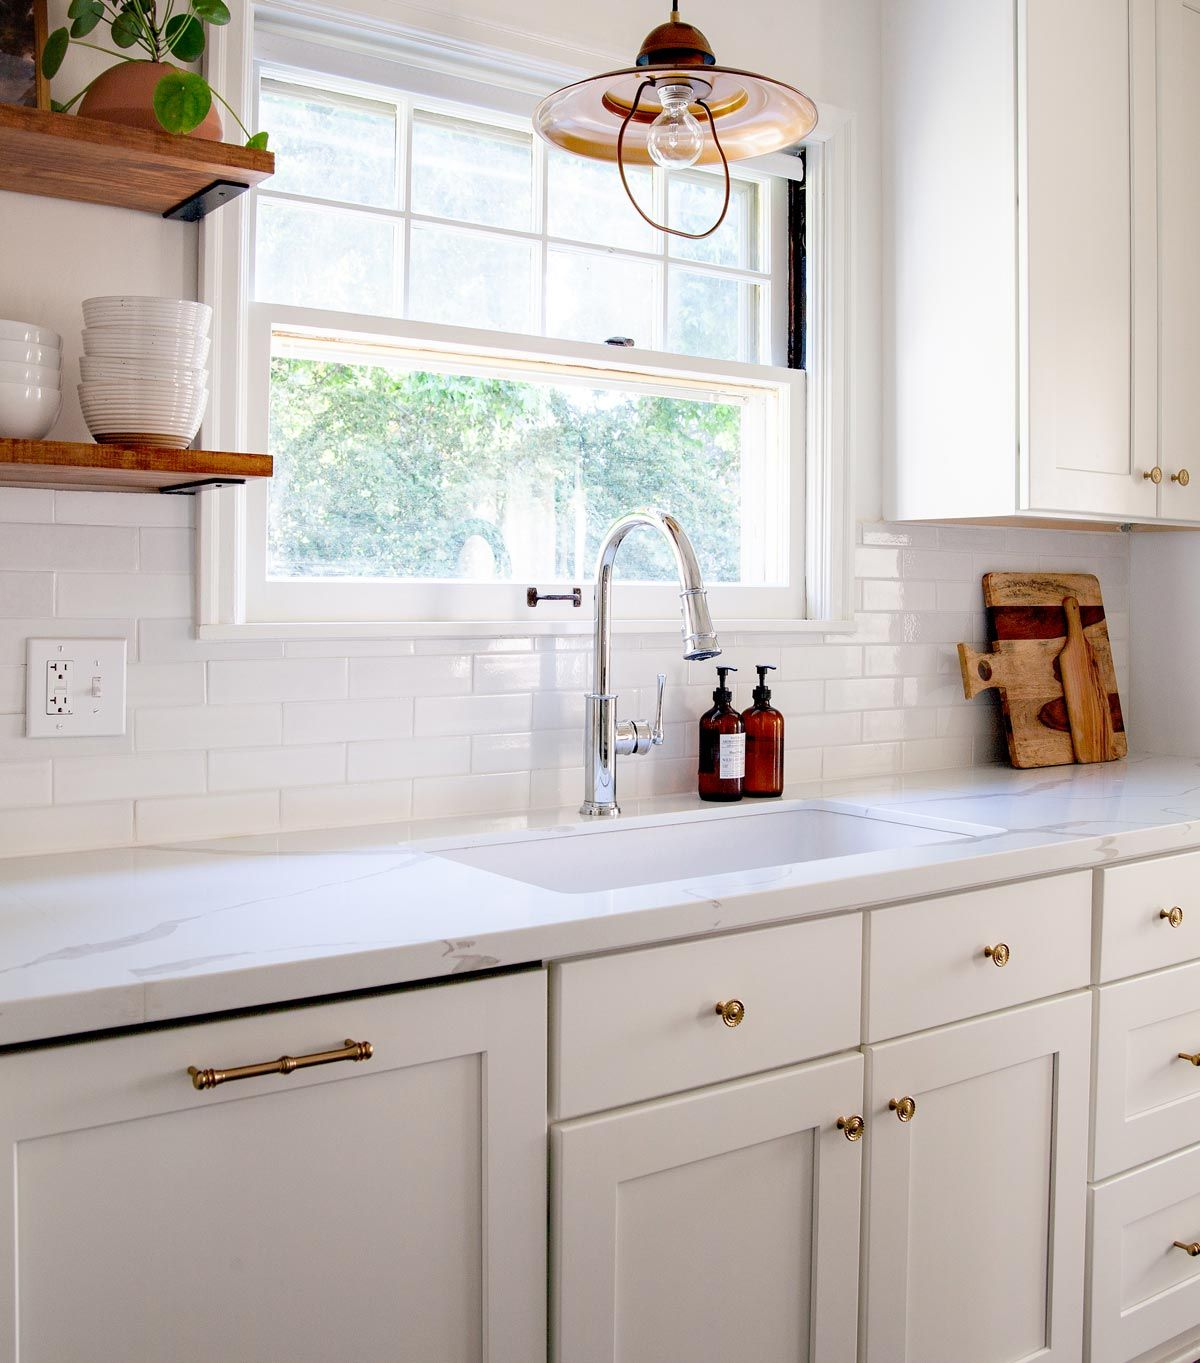 Best Rta Cabinets Rave Reviews Amazing Service New Kitchen Designs Free Kitchen Design Kitchen Measurements